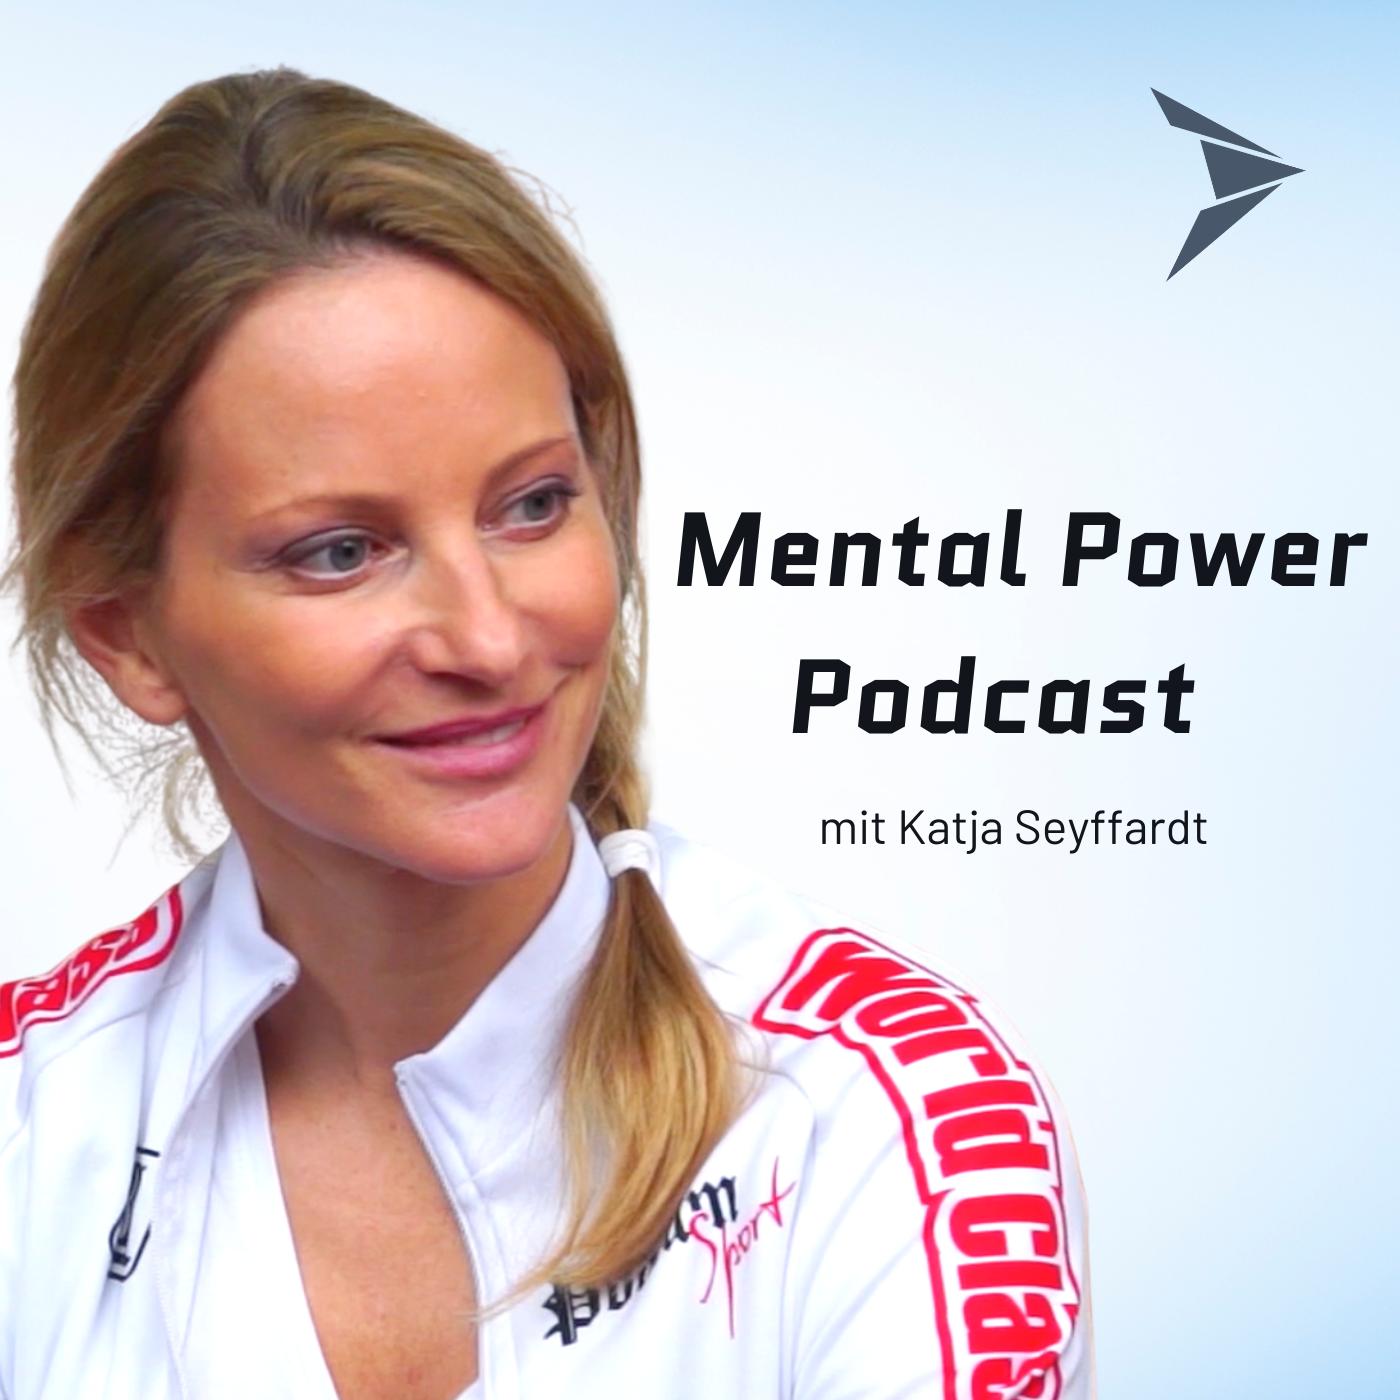 Mental Power Podcast show art